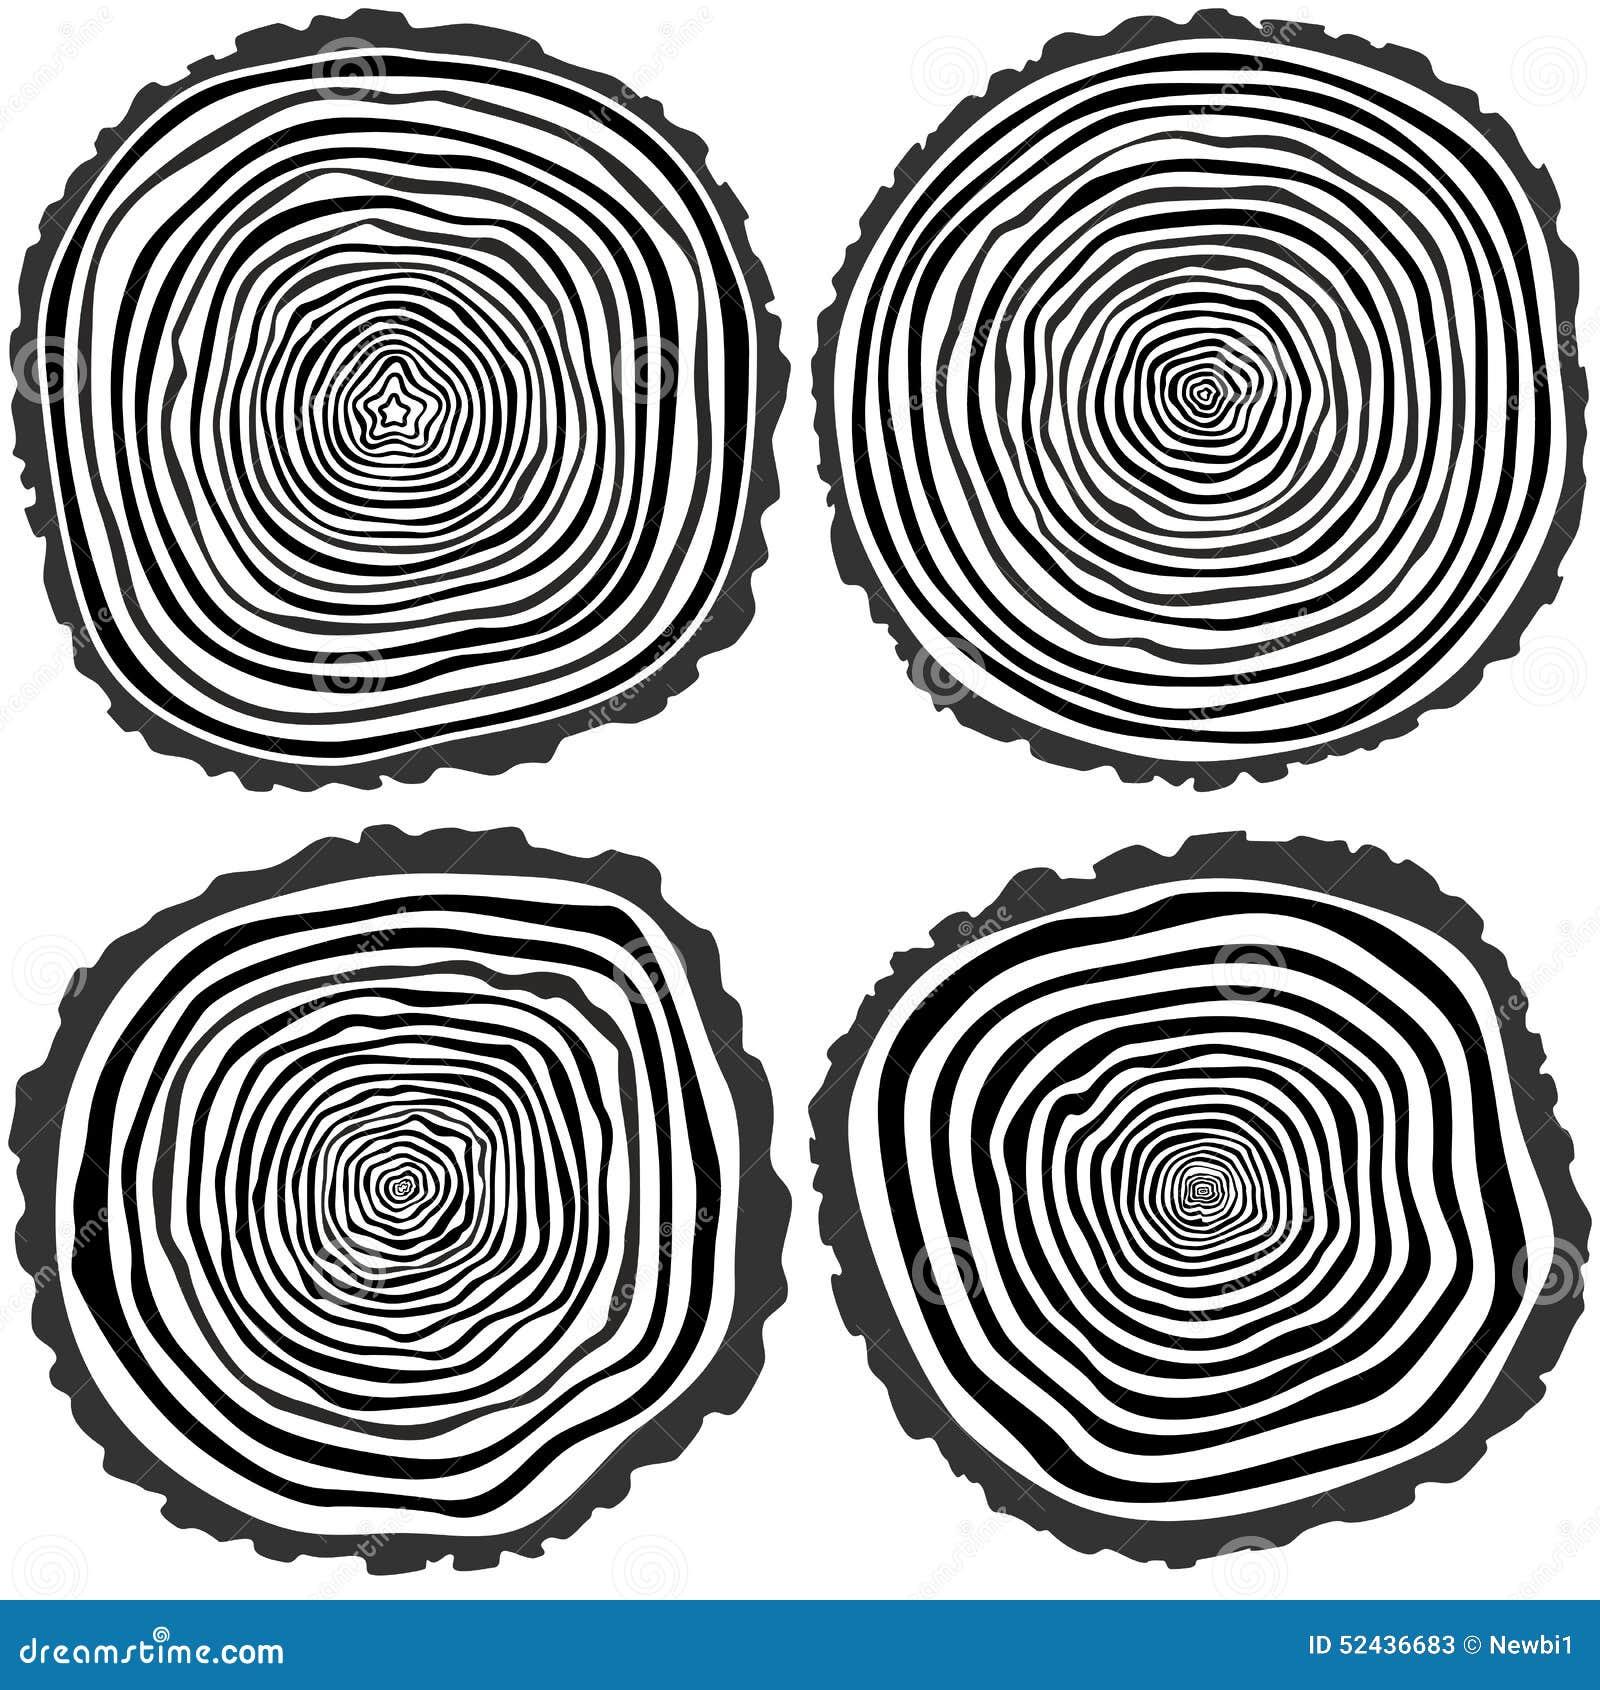 Cut Tree Icons, Tree Rings Illustration Stock Illustration - Image ...